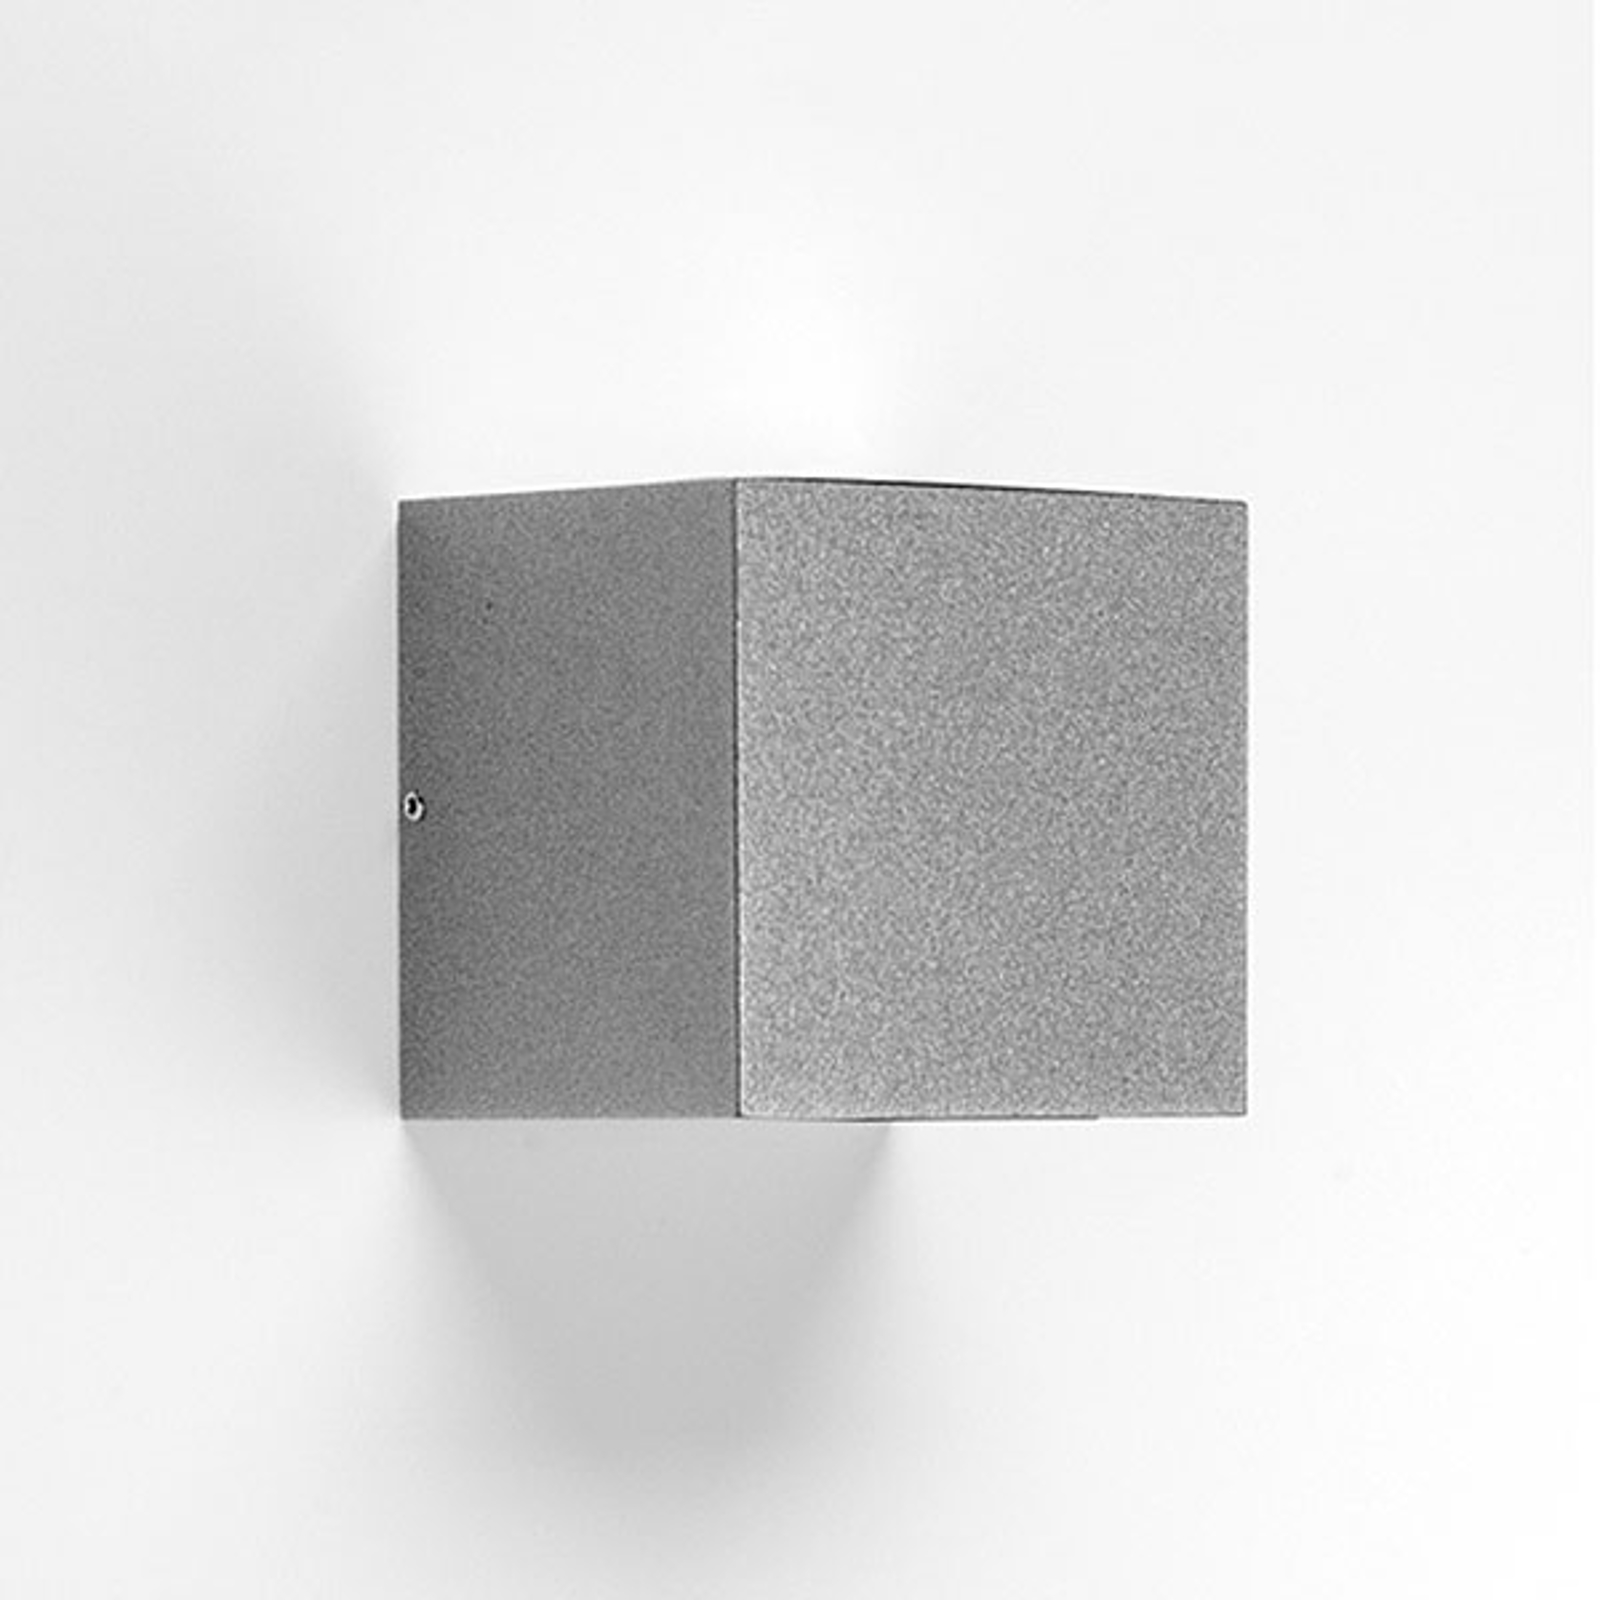 Harmaa LED-seinävalaisin 303355, 1WB, 4 000 K